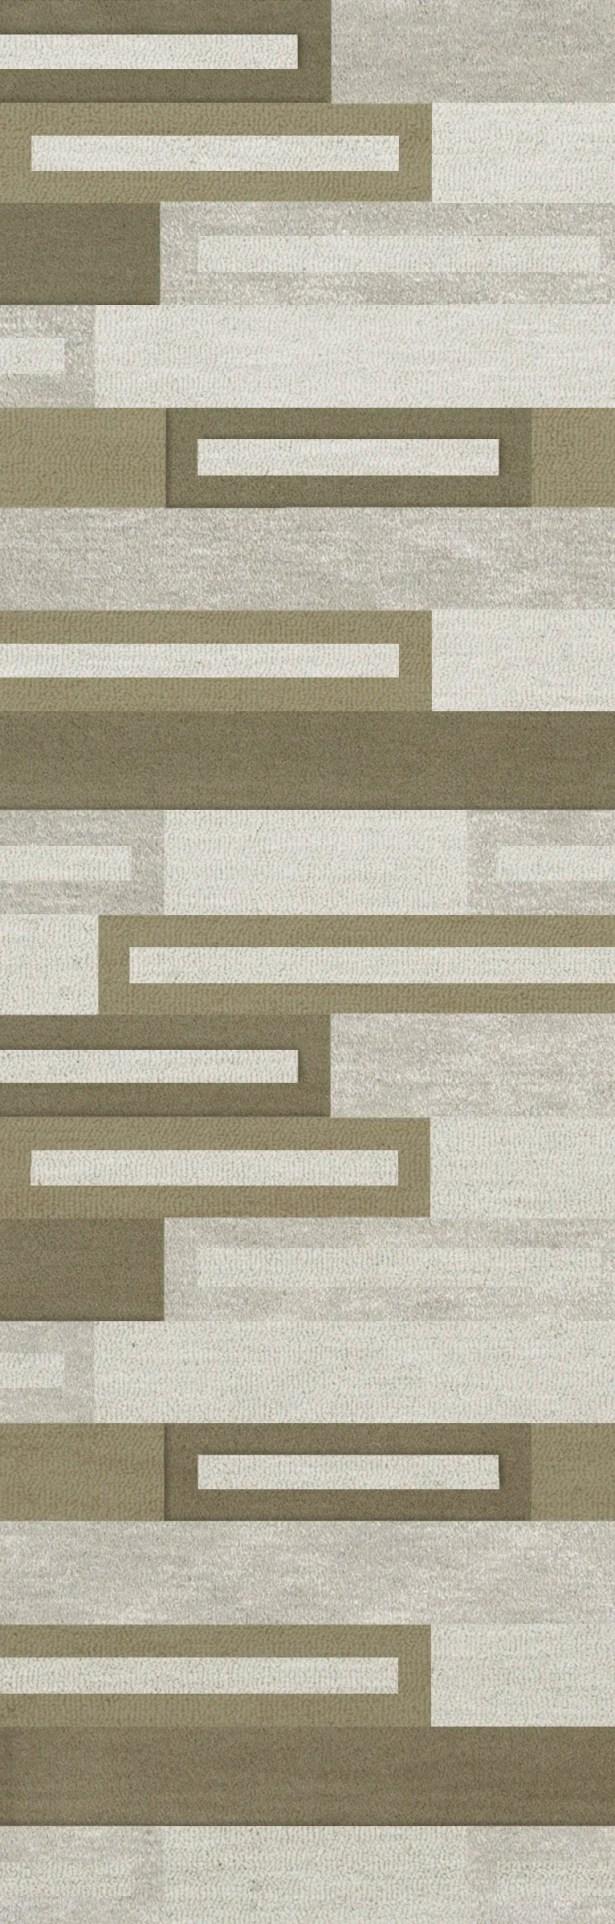 Bella Machine Woven Wool Gray/ Brown Area Rug Rug Size: Runner 2'6